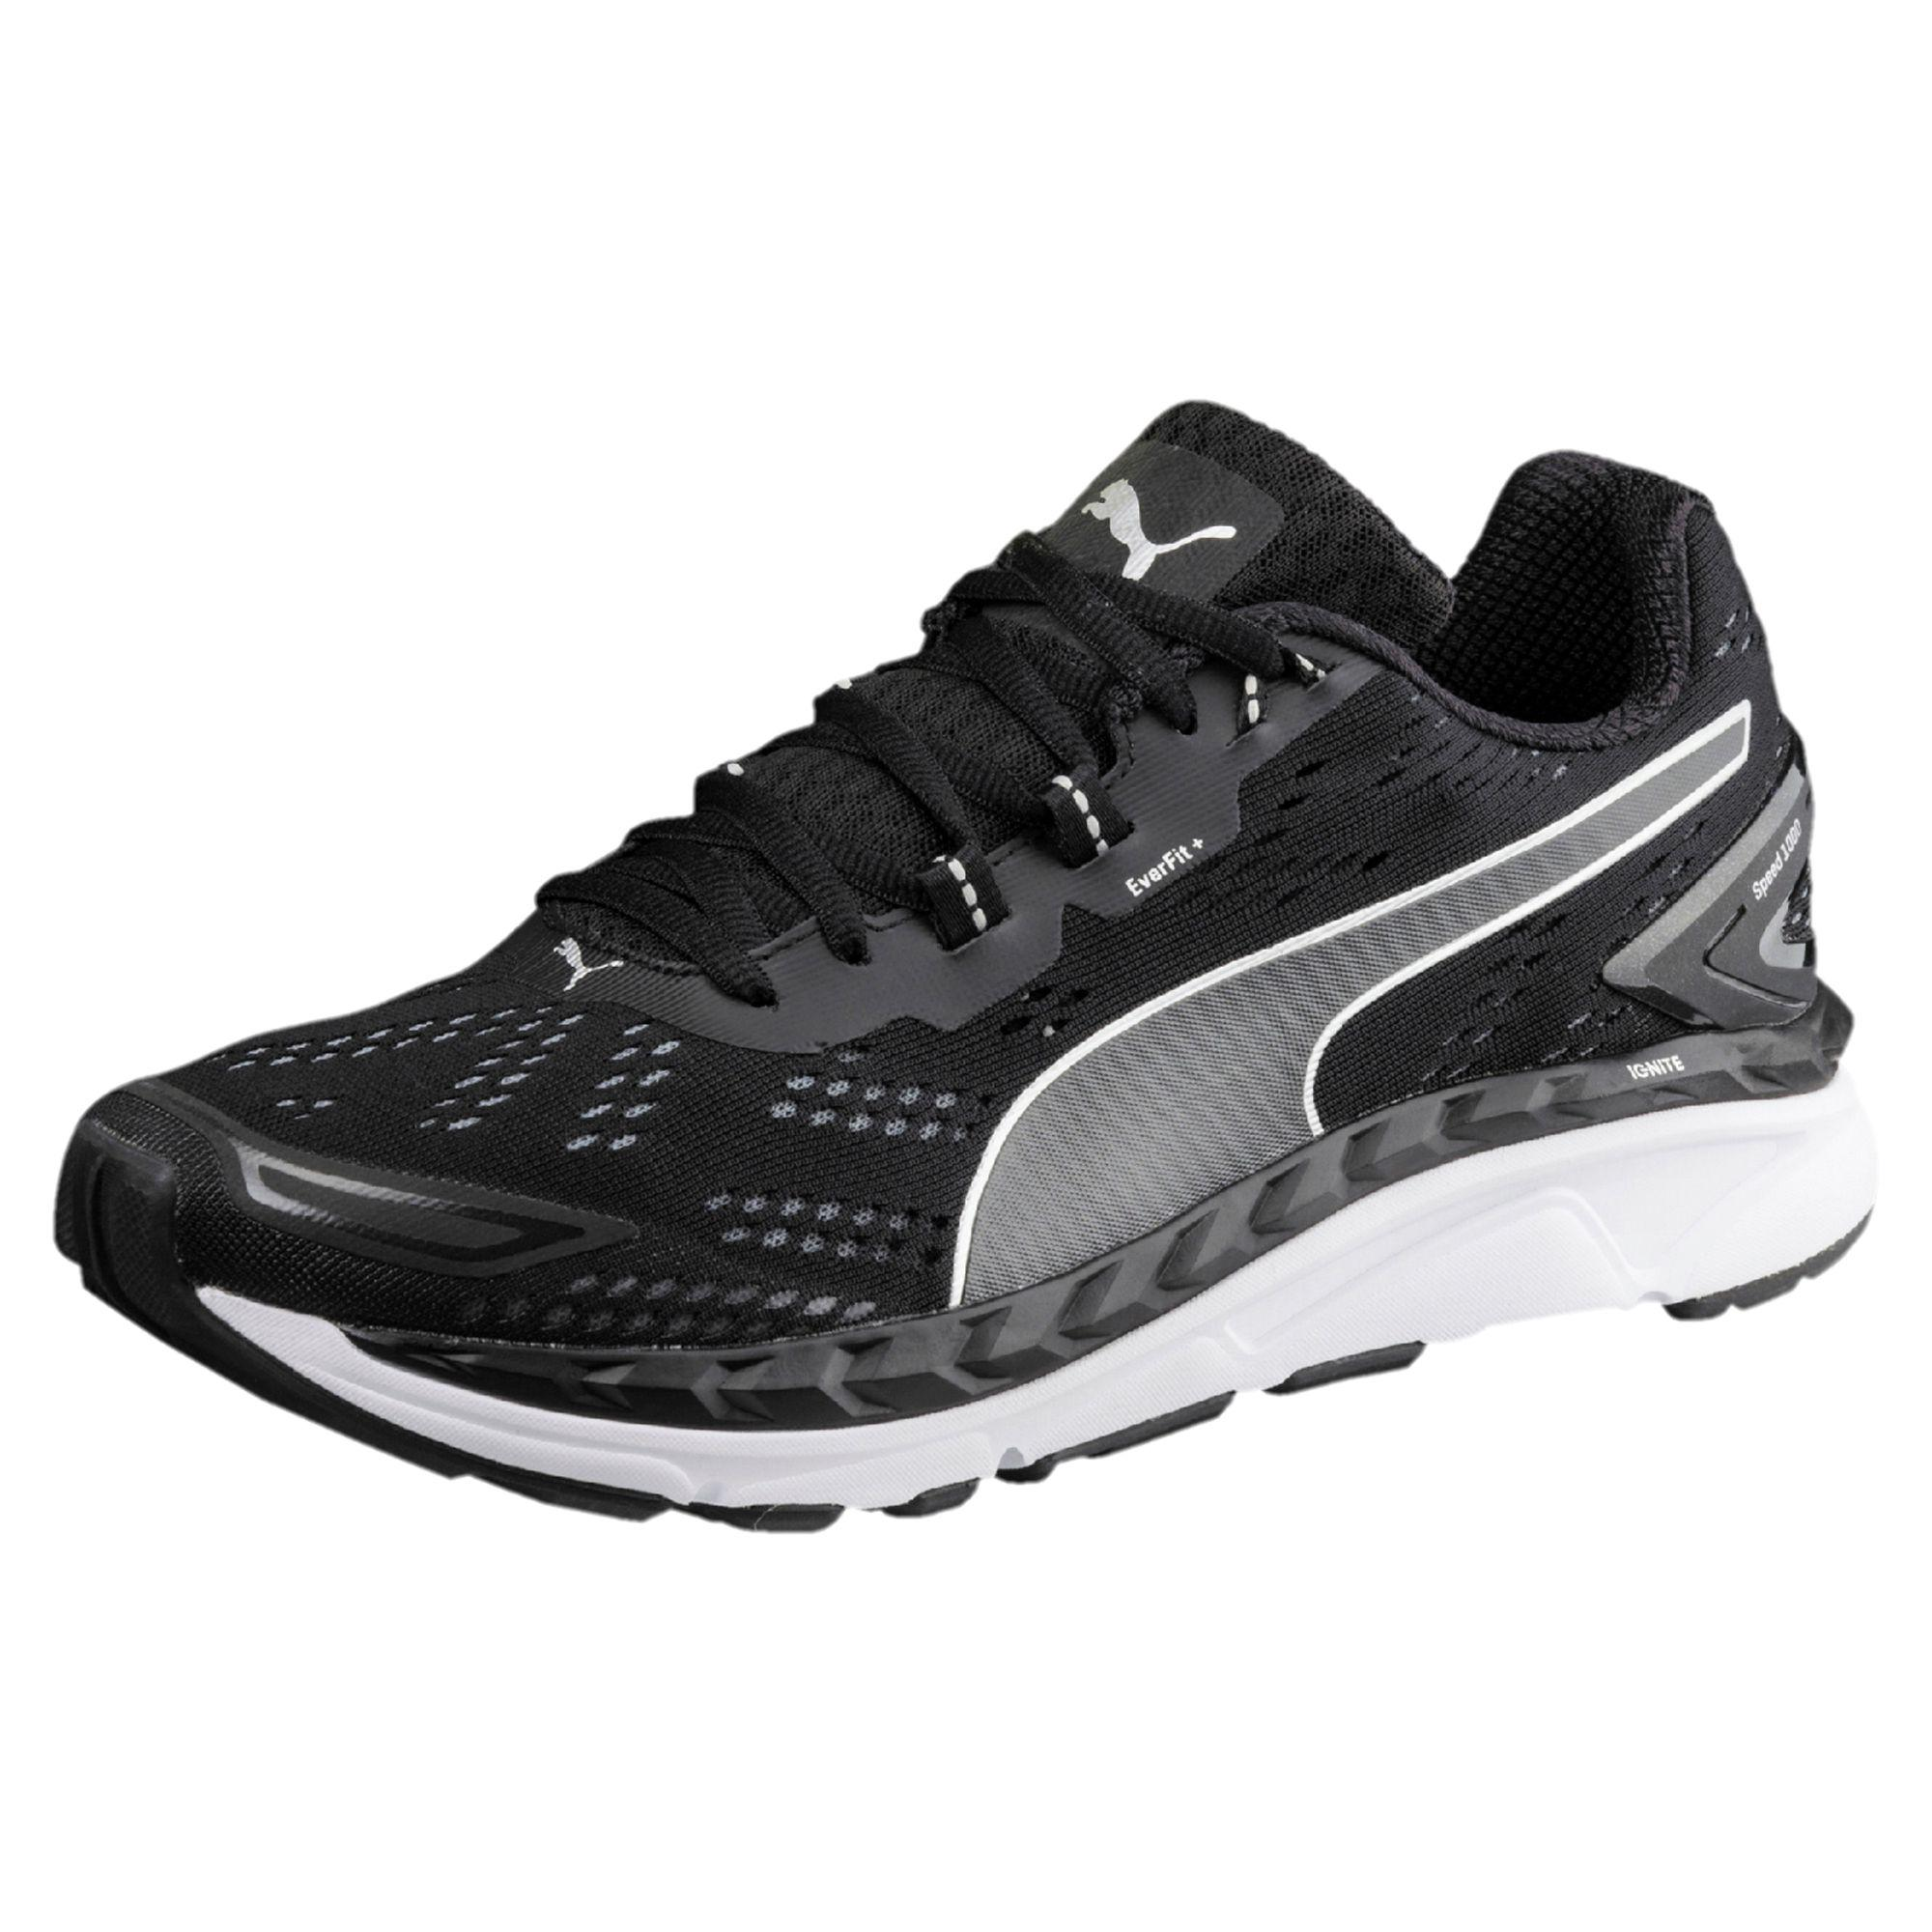 Lyst - PUMA Speed 1000 Ignite Men s Running Shoes in Black for Men 766e3ac35